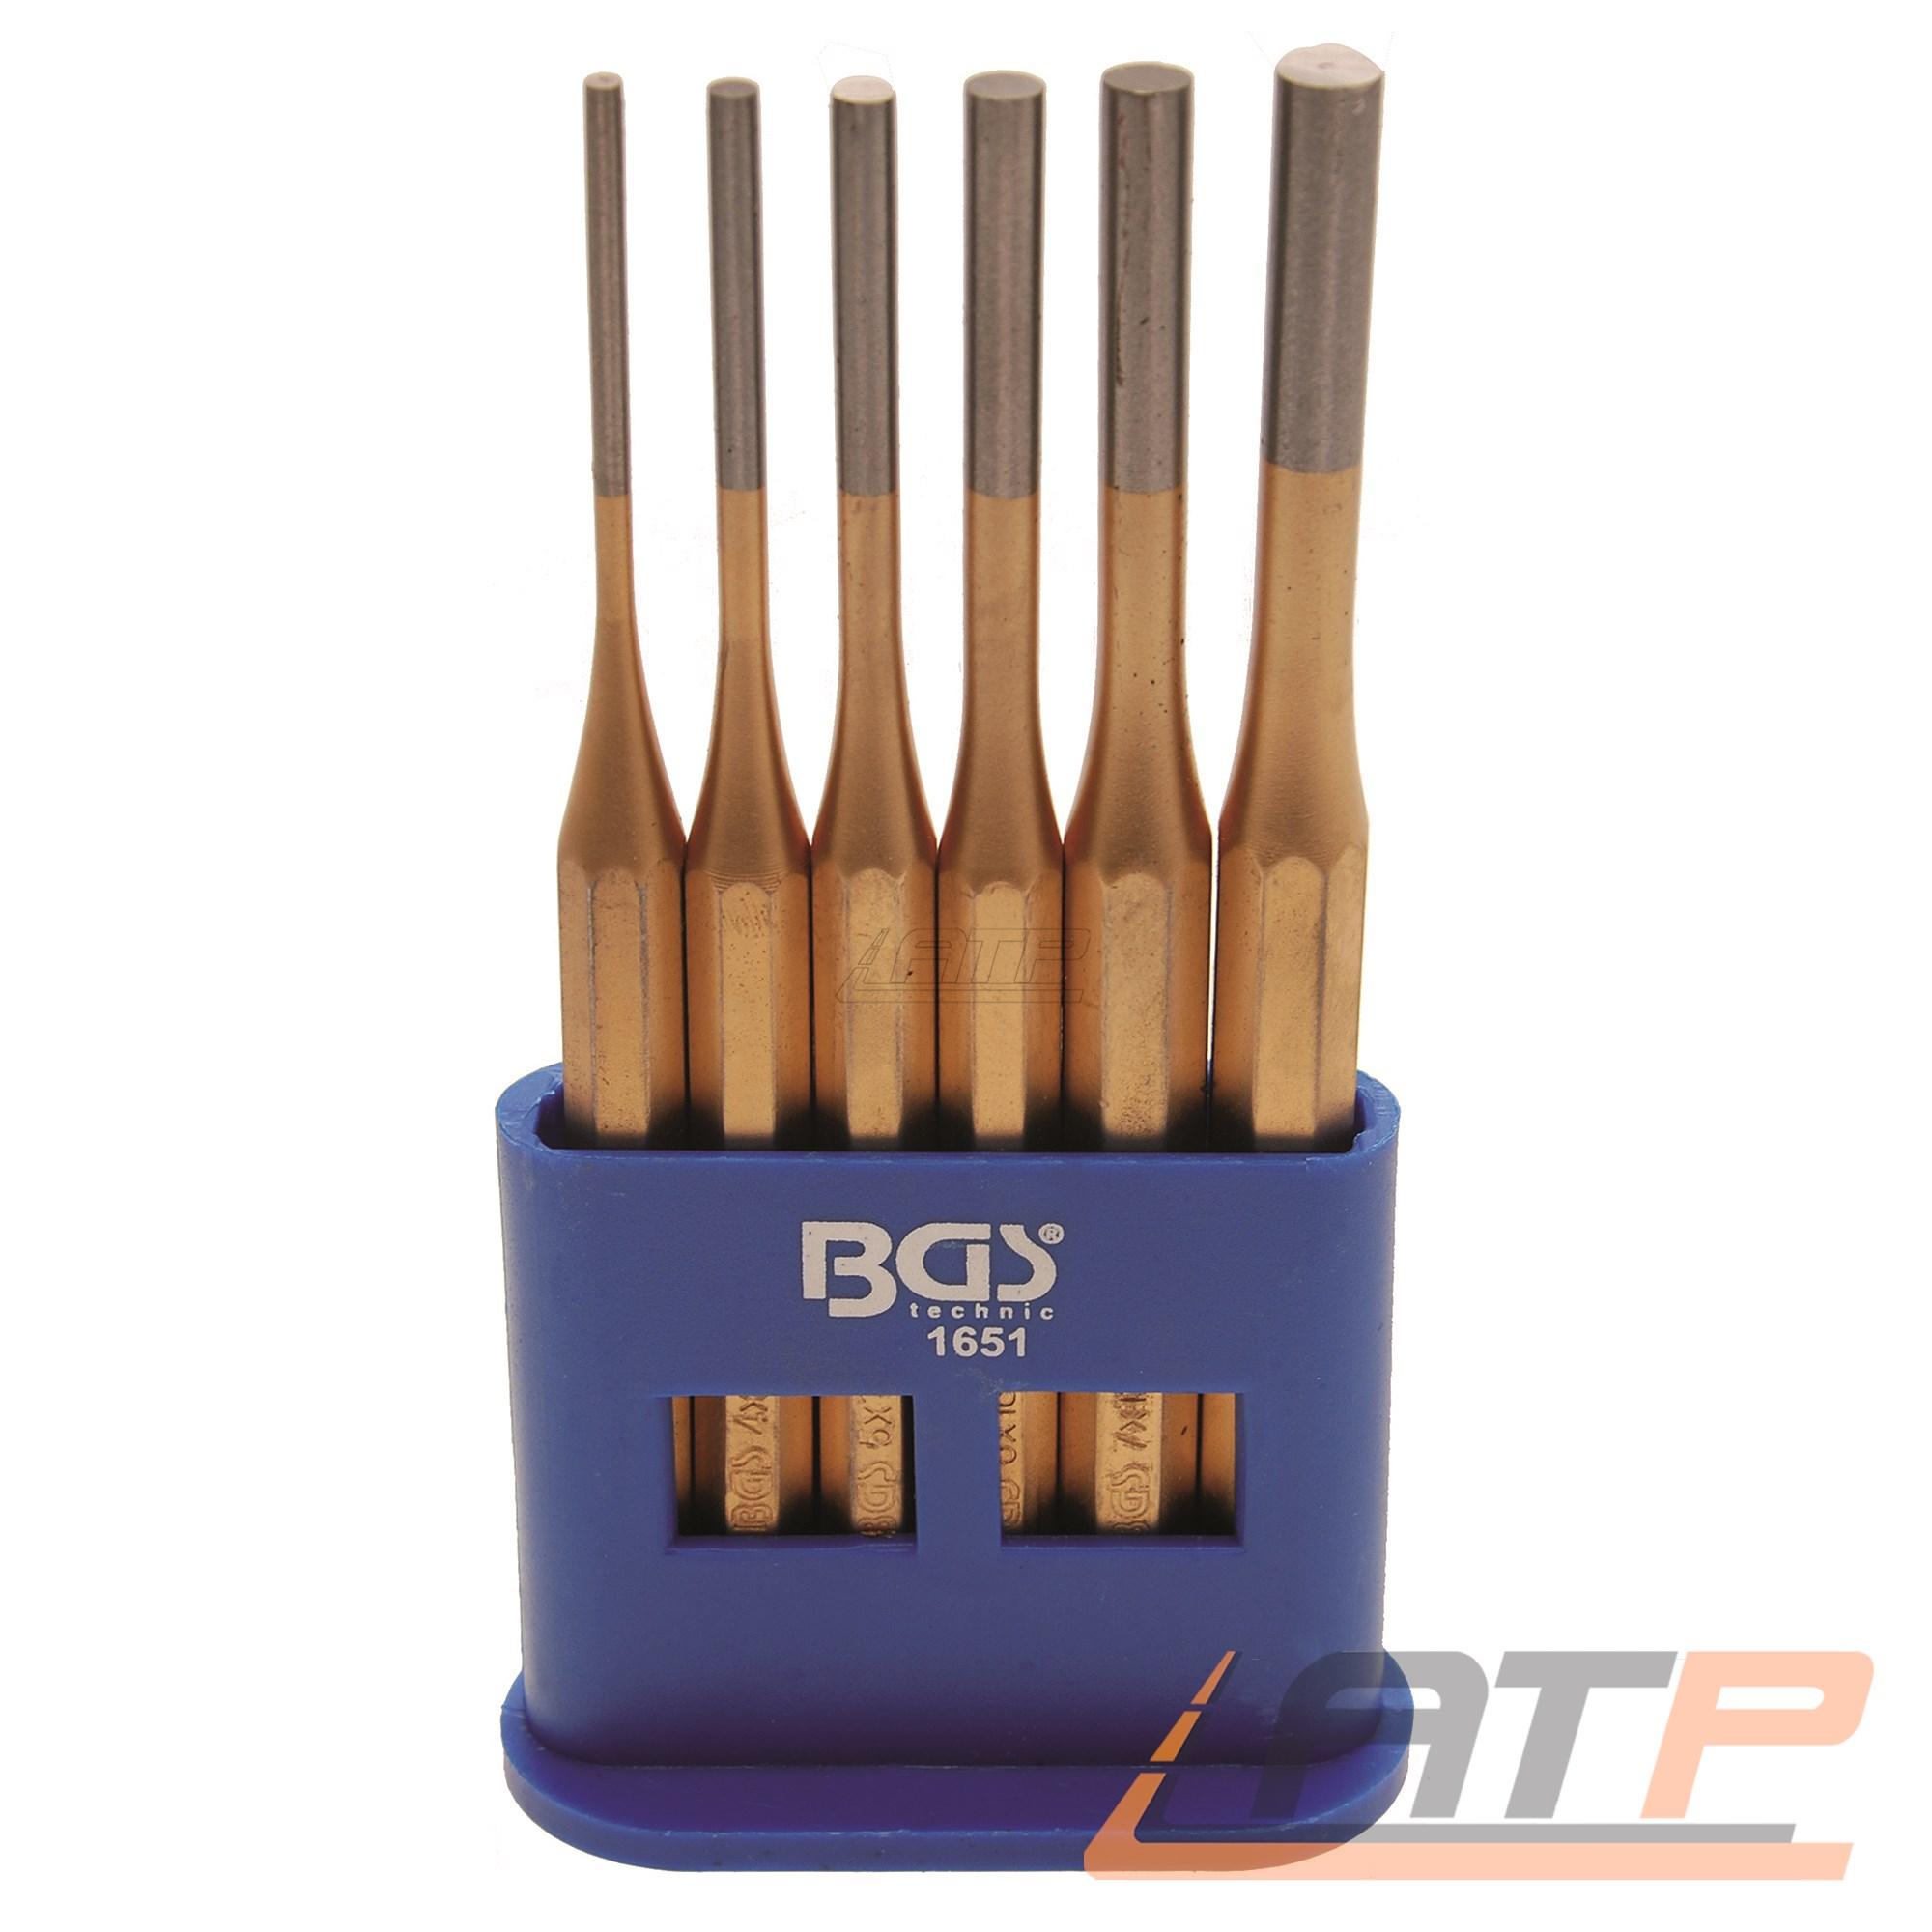 7 Splinttreiber Splintentreiber Durchtreiber 6 tlg 6 5 4 3 8 x 150 mm